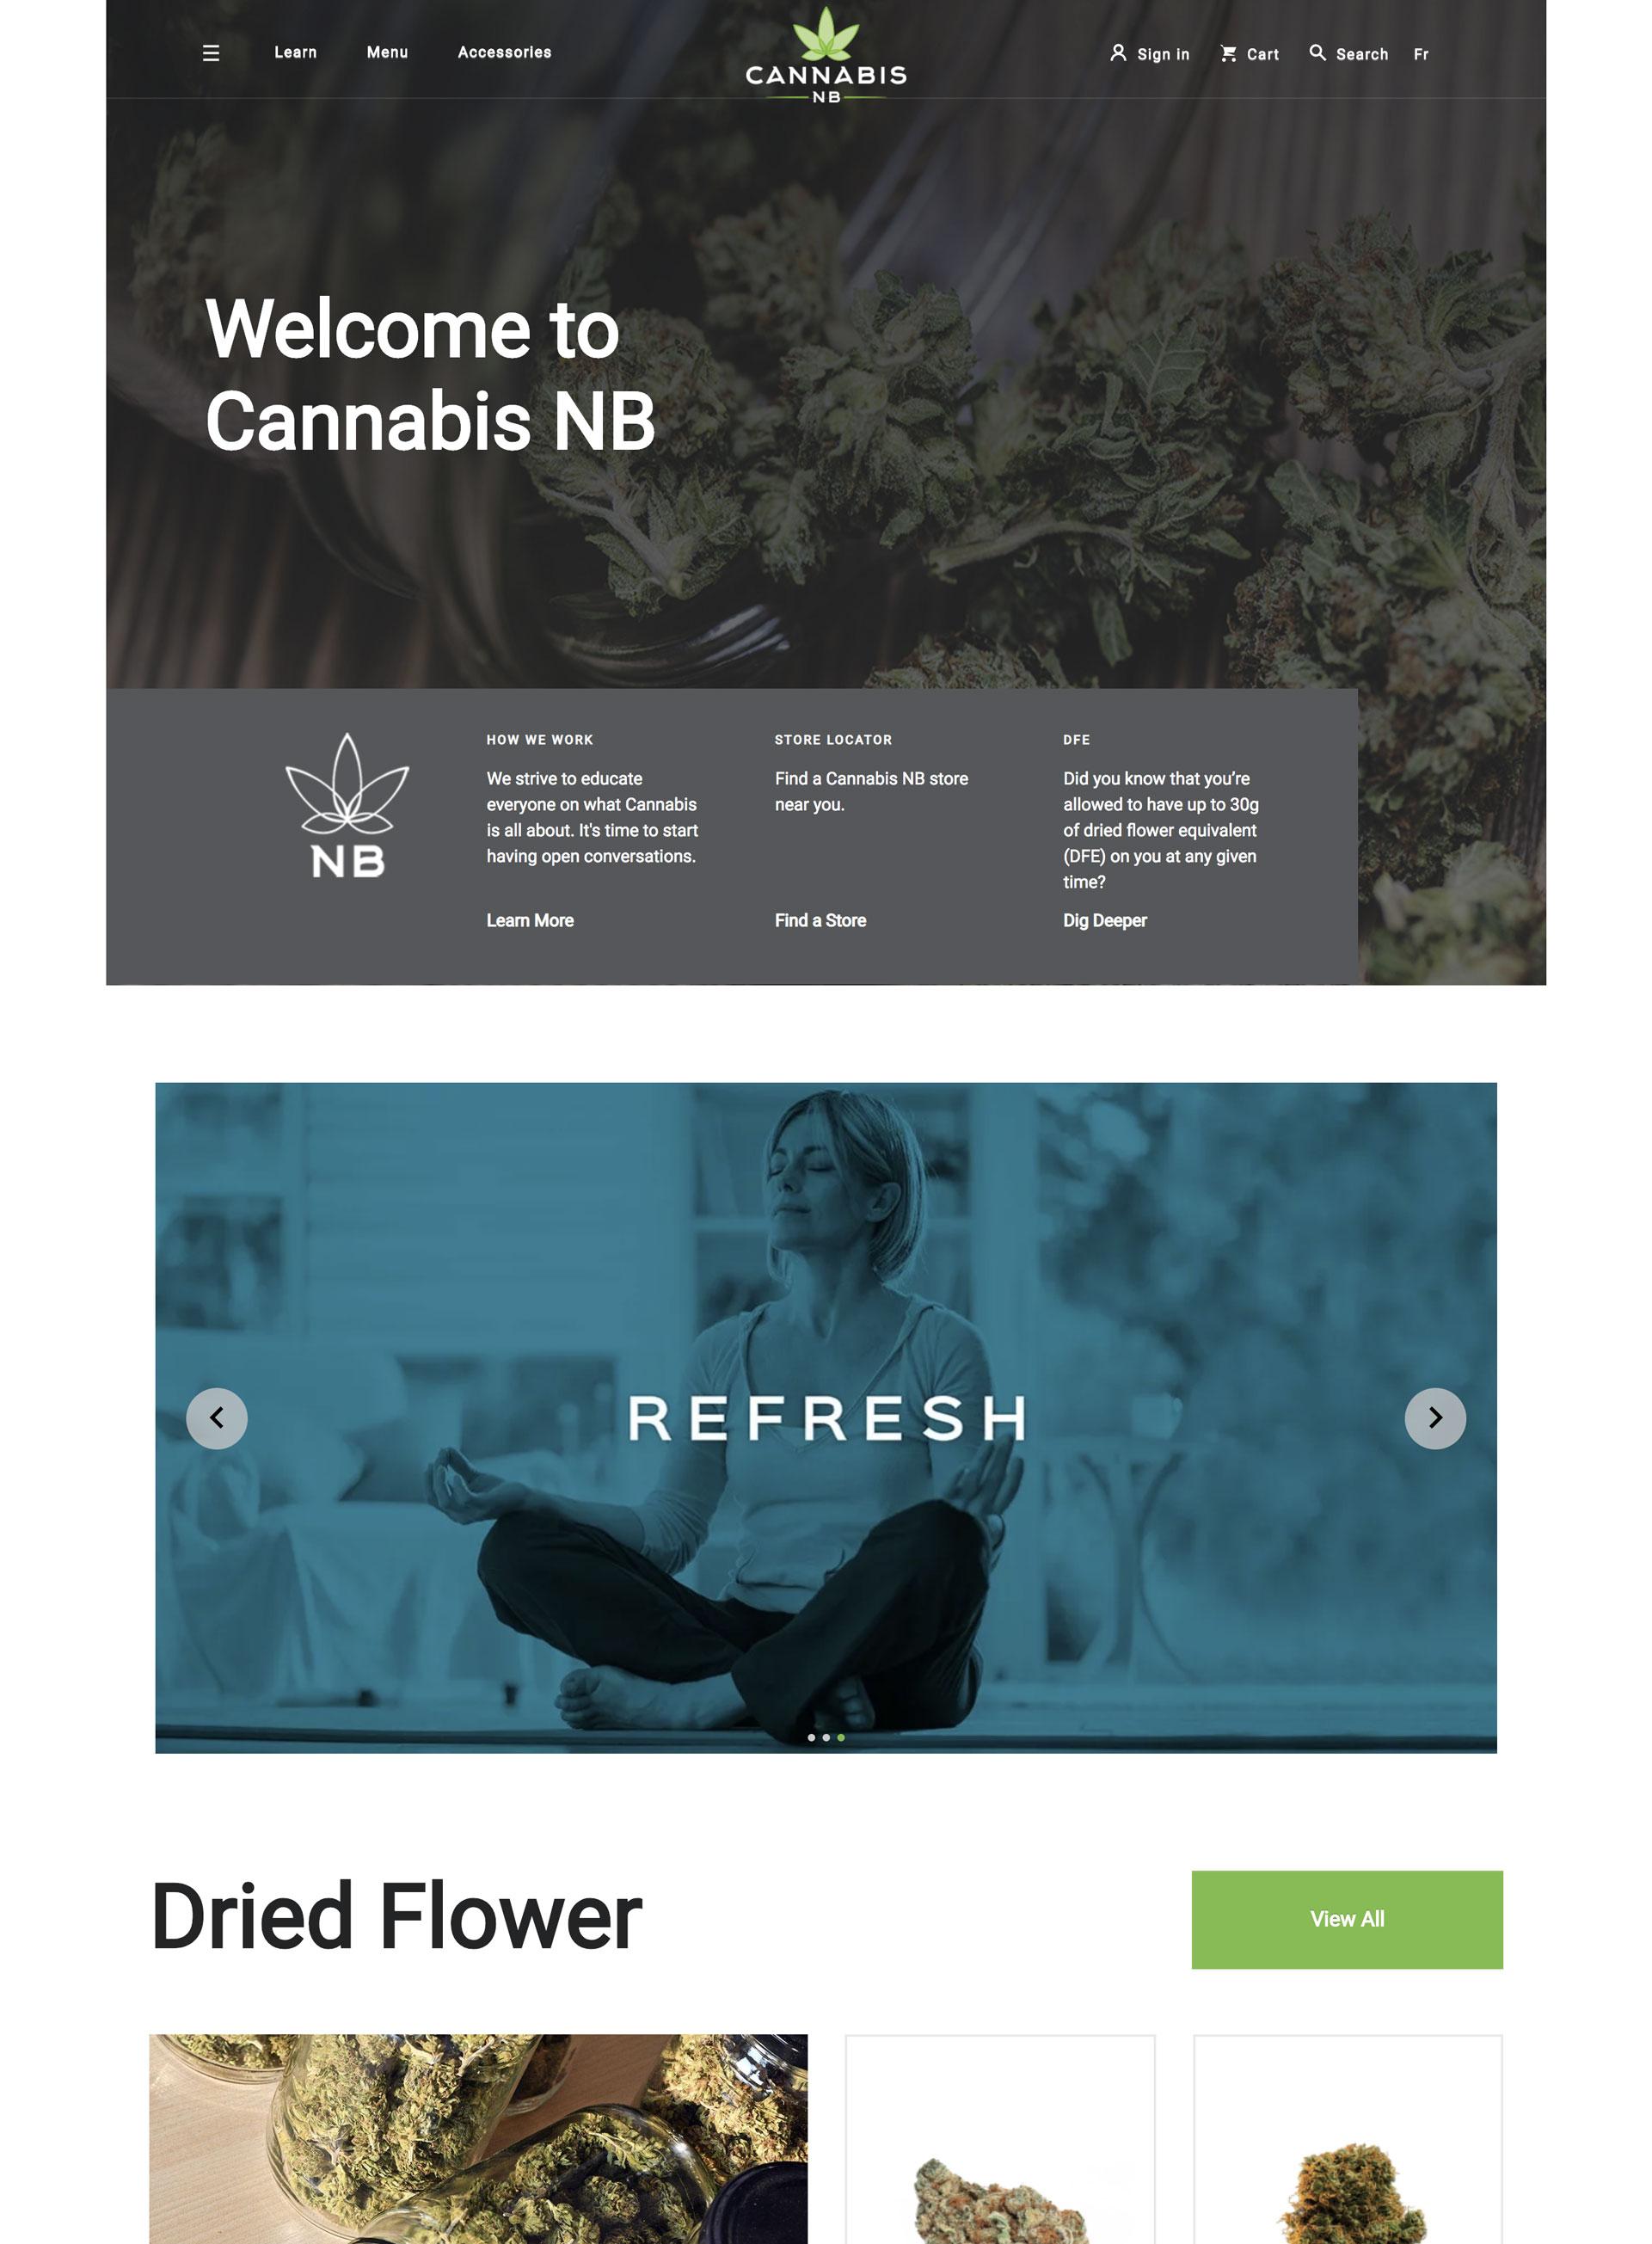 https://www.cannabis-nb.com/